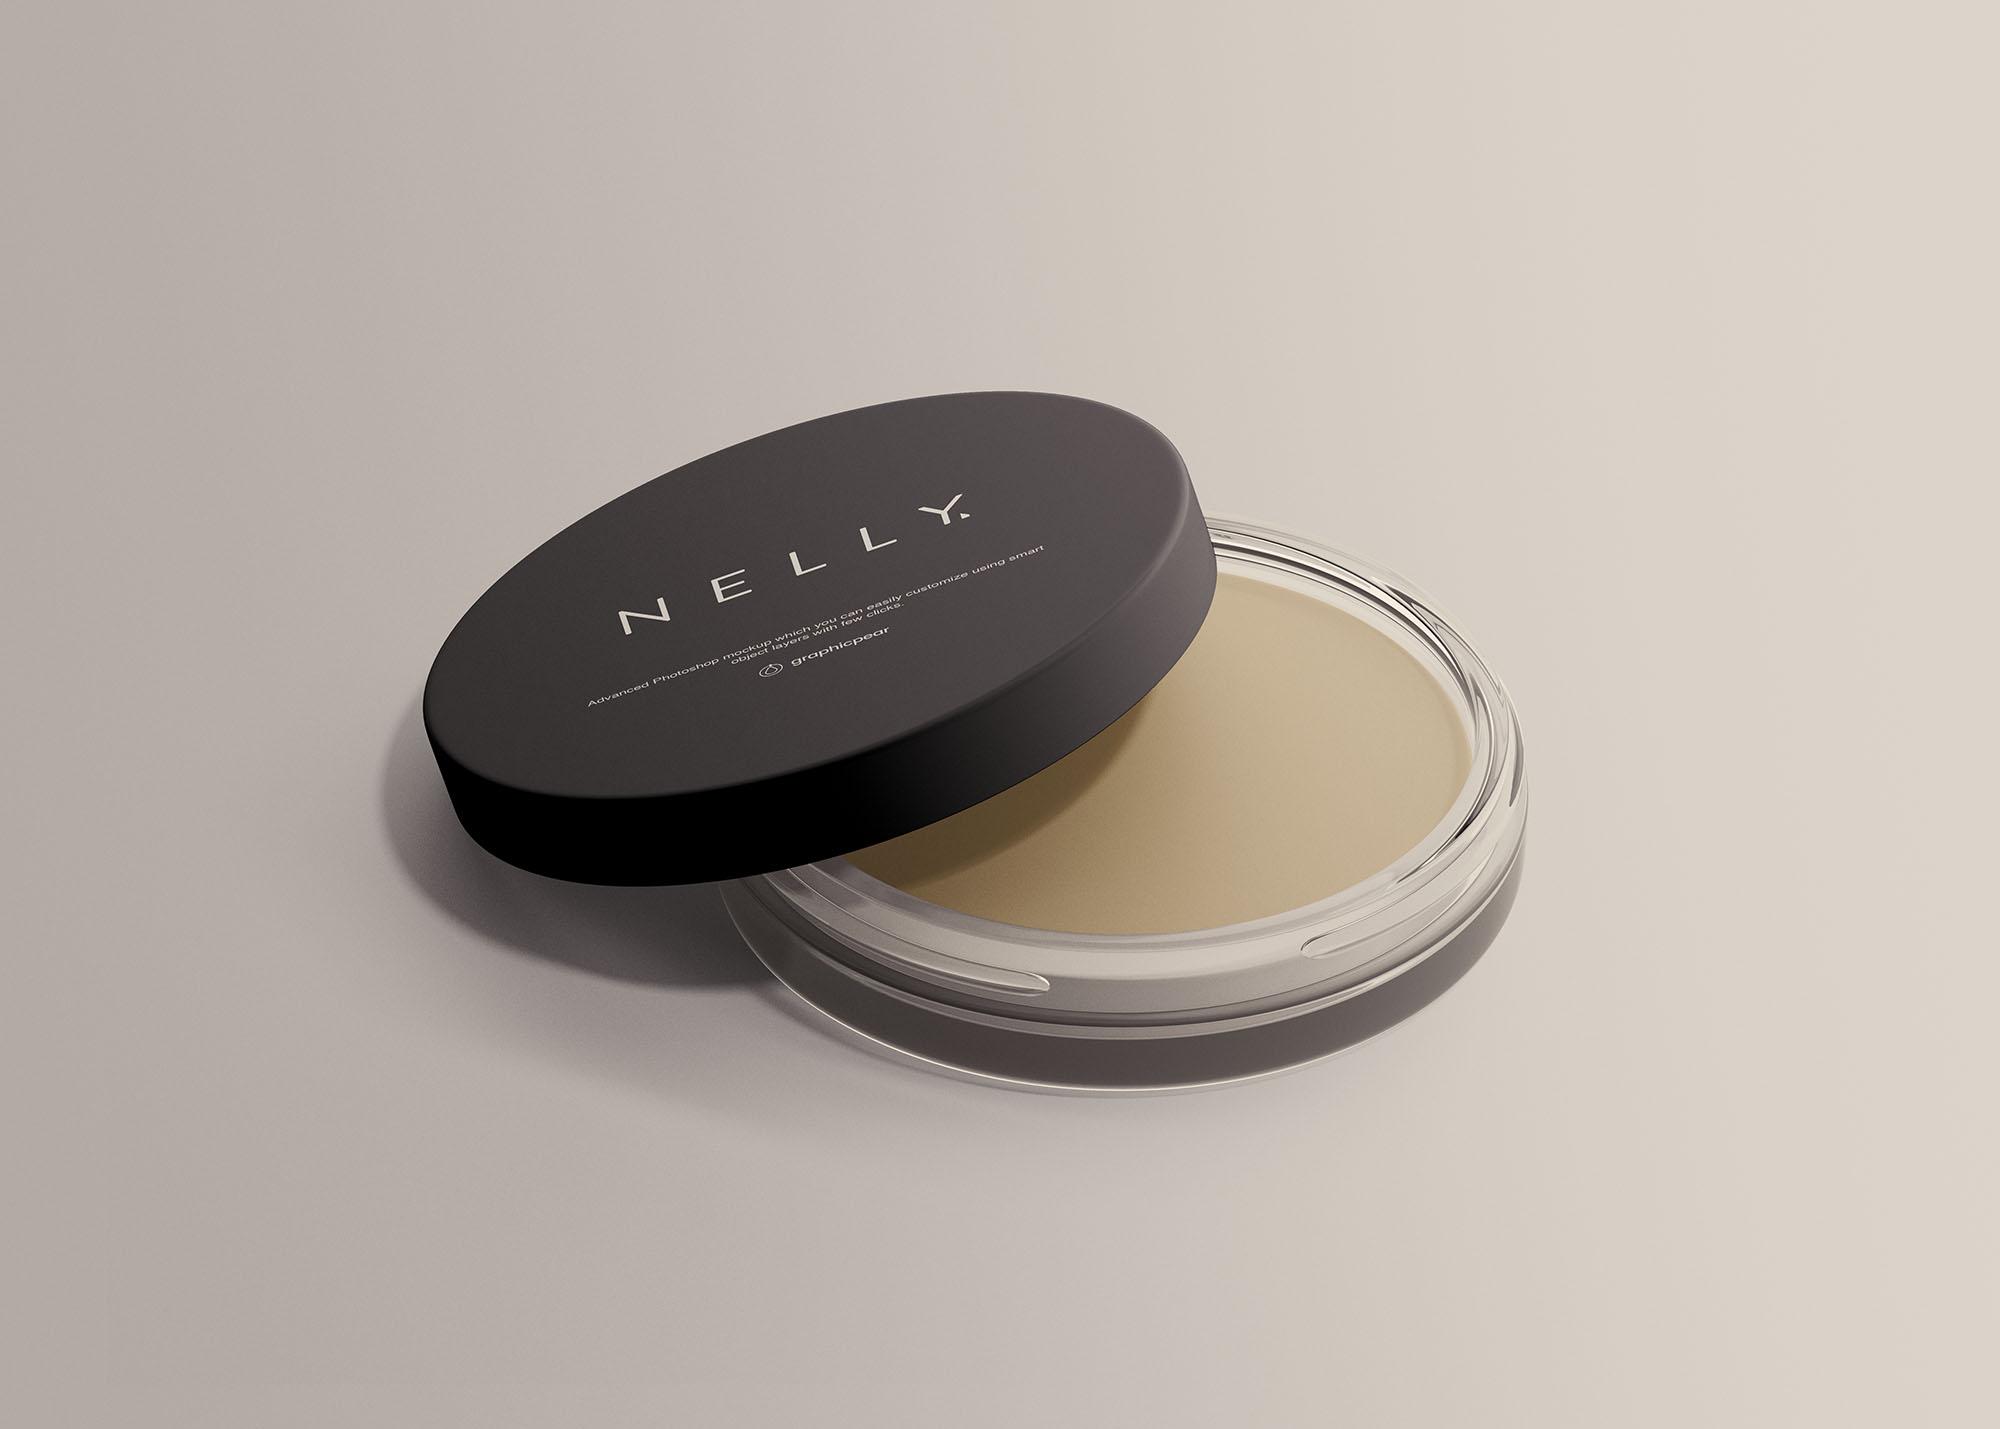 护肤品化妆品盒子包装展示样机 Clear Glass Cosmetic Jar Mockup